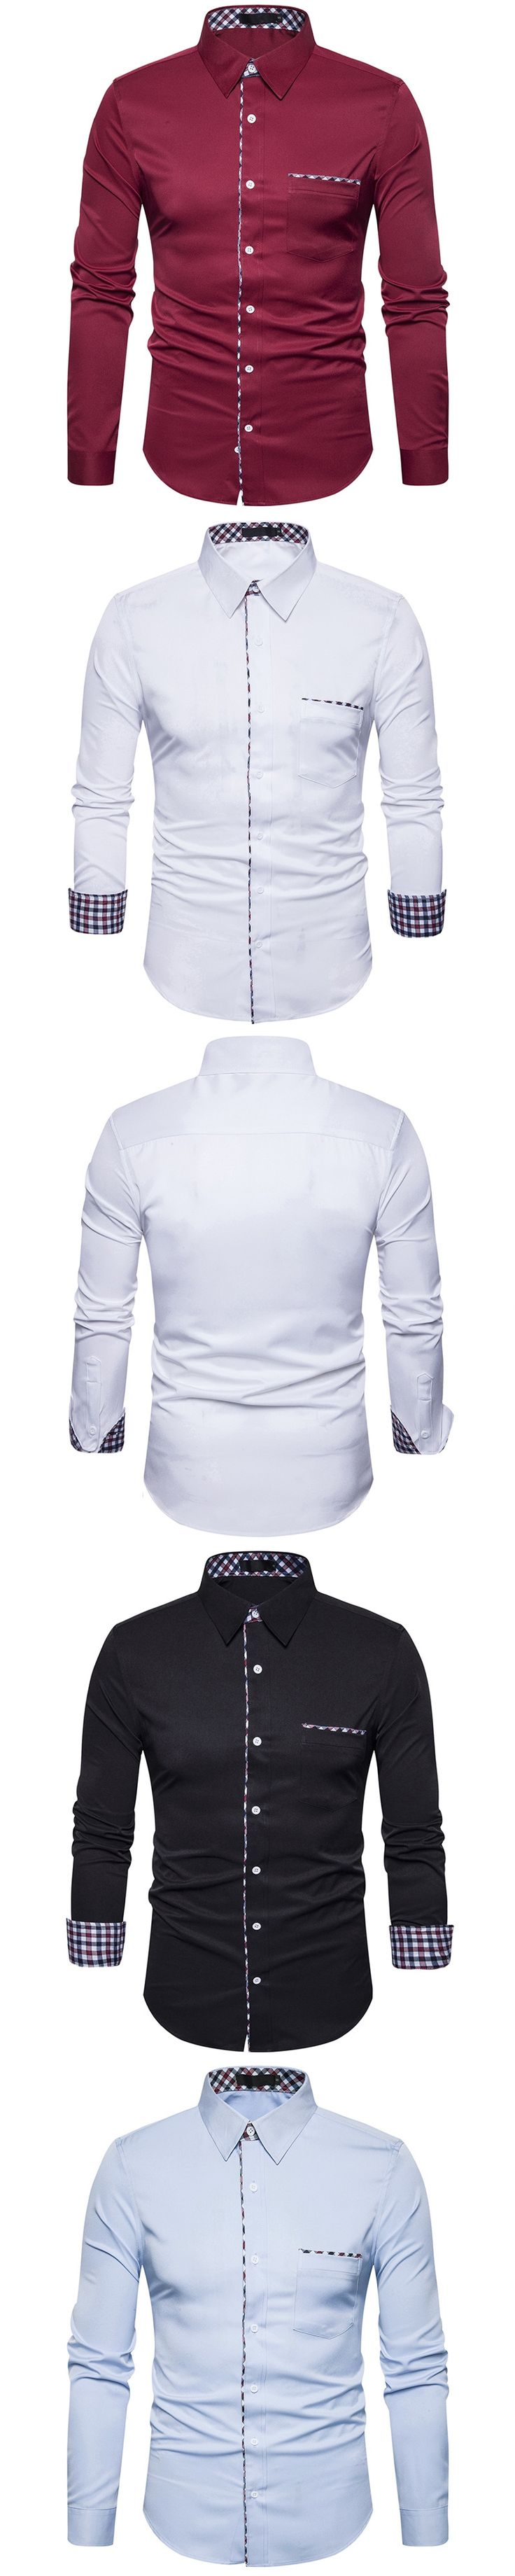 Zeeshant Cotton Tuxedo Shirt Men Formal Solid Color Chemise Homme Cufflink Wedding Shirts in Men's Tuxedo Shirt XXL